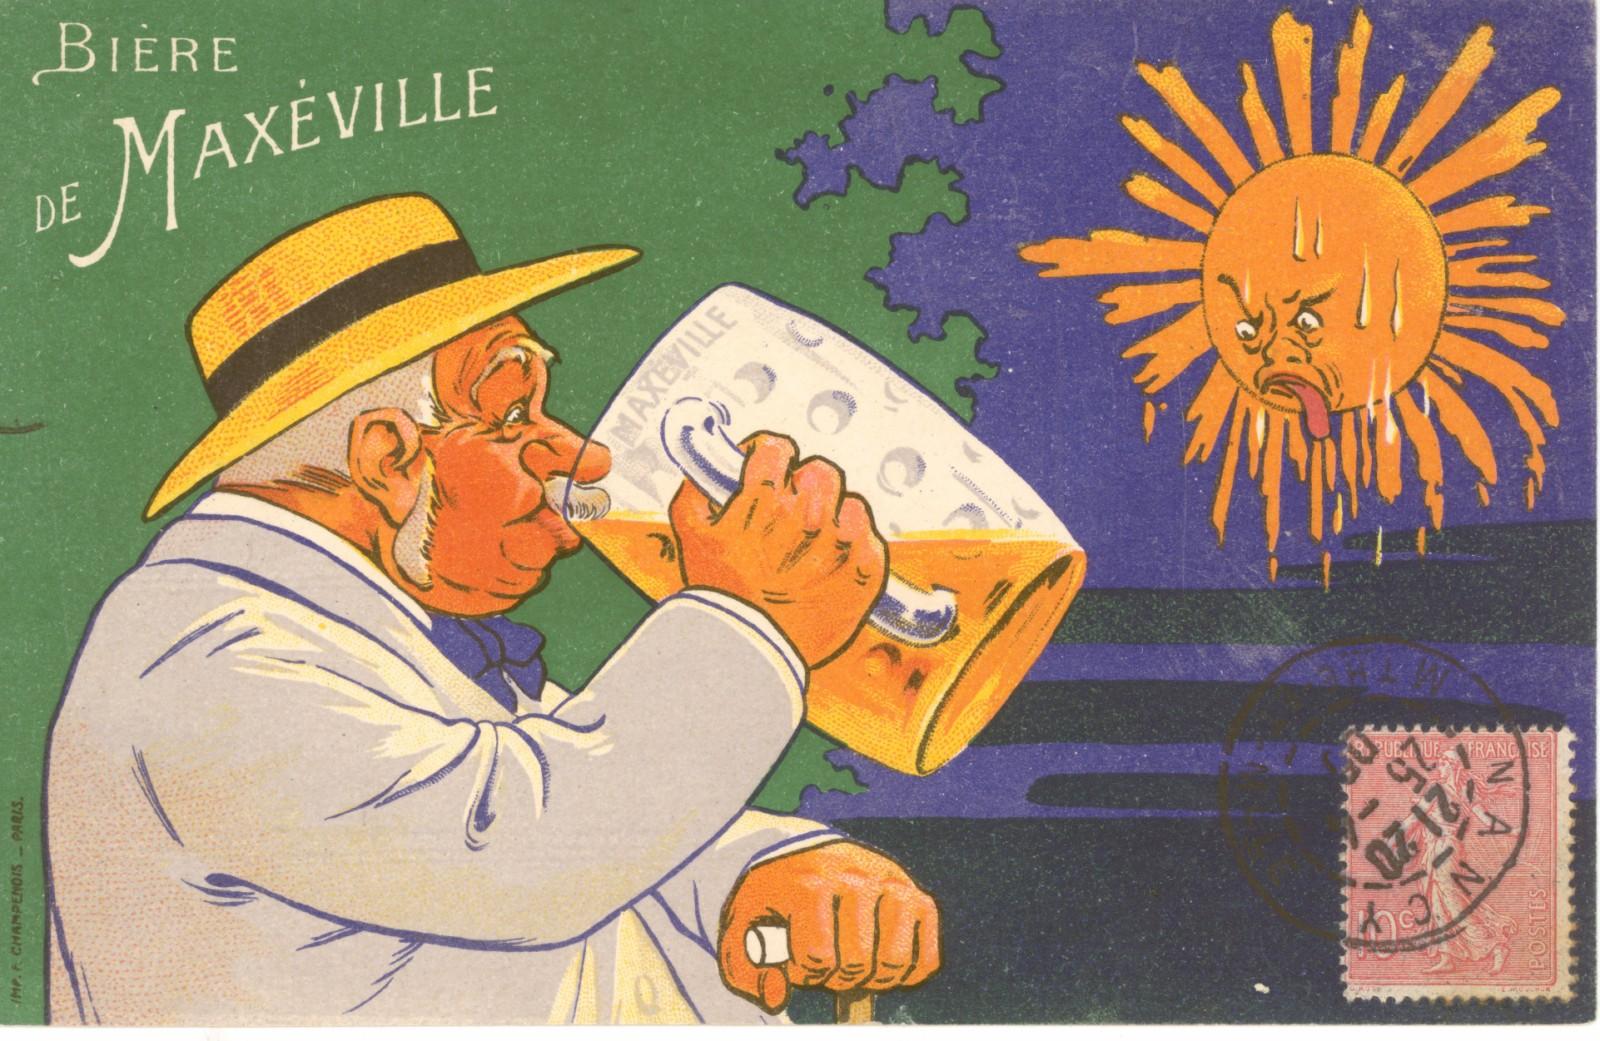 Carte postale des grandes brasseries de Maxéville, intitulée